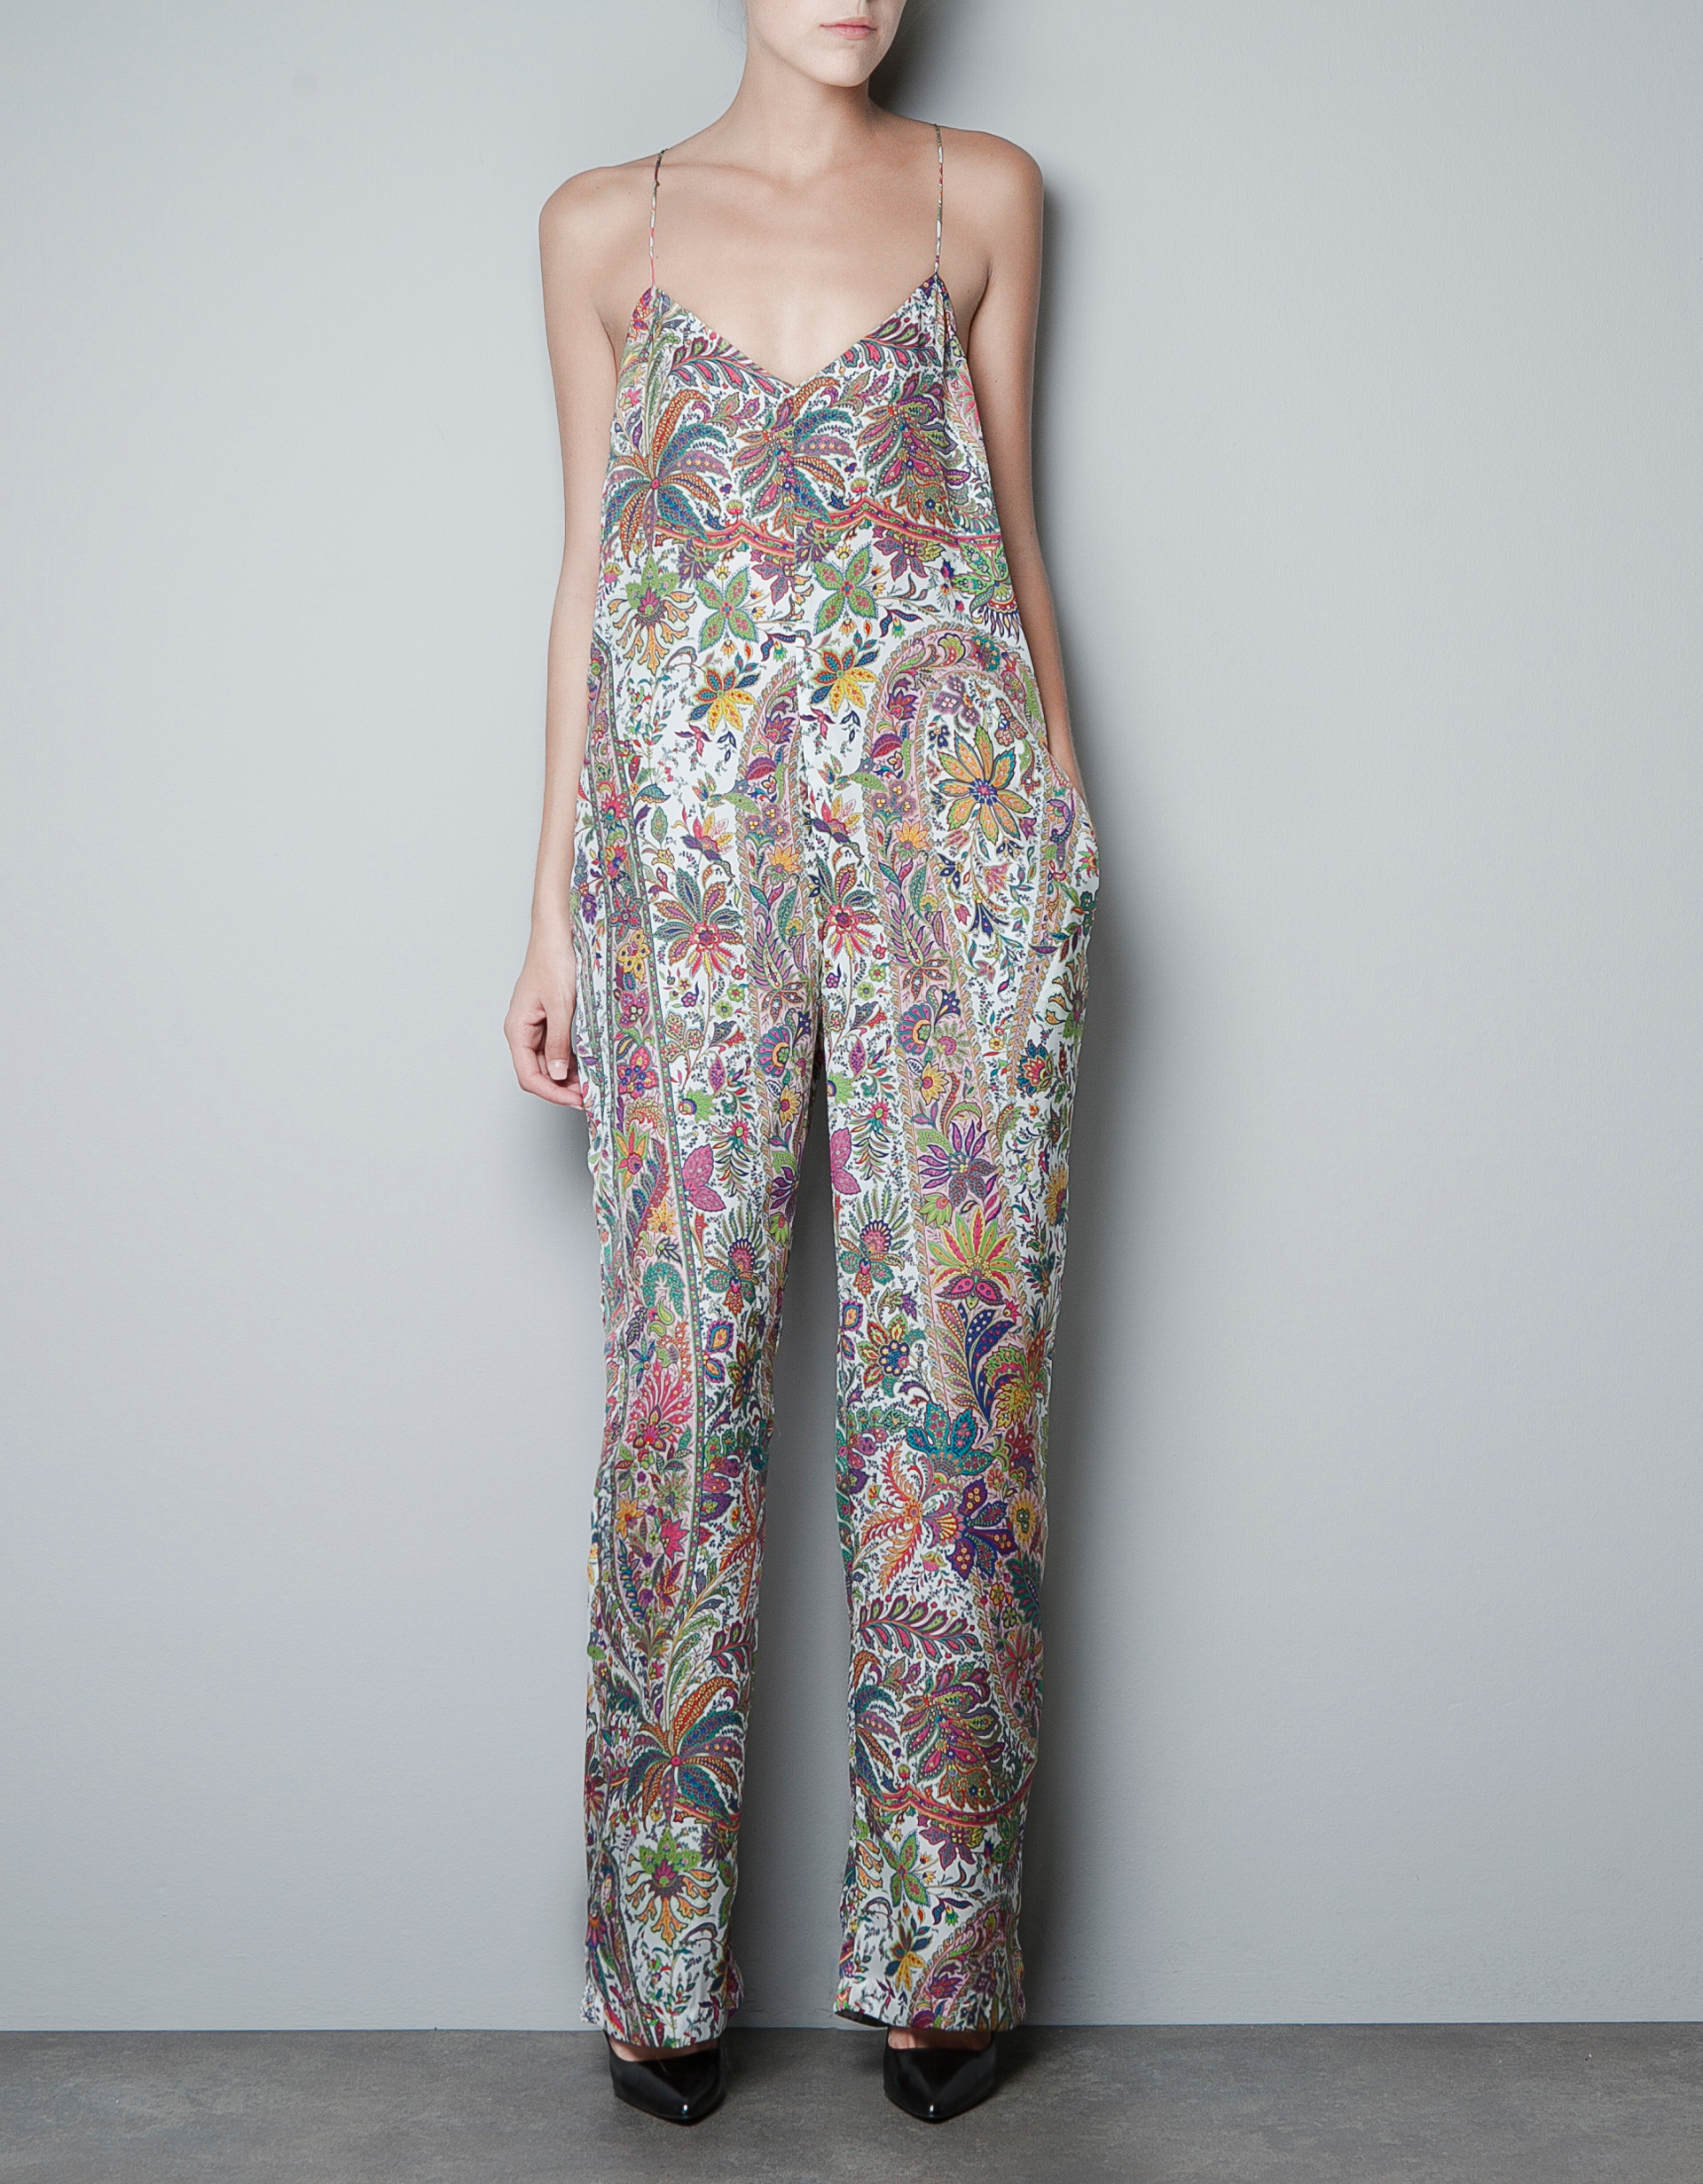 Zara Paisley Jumpsuit